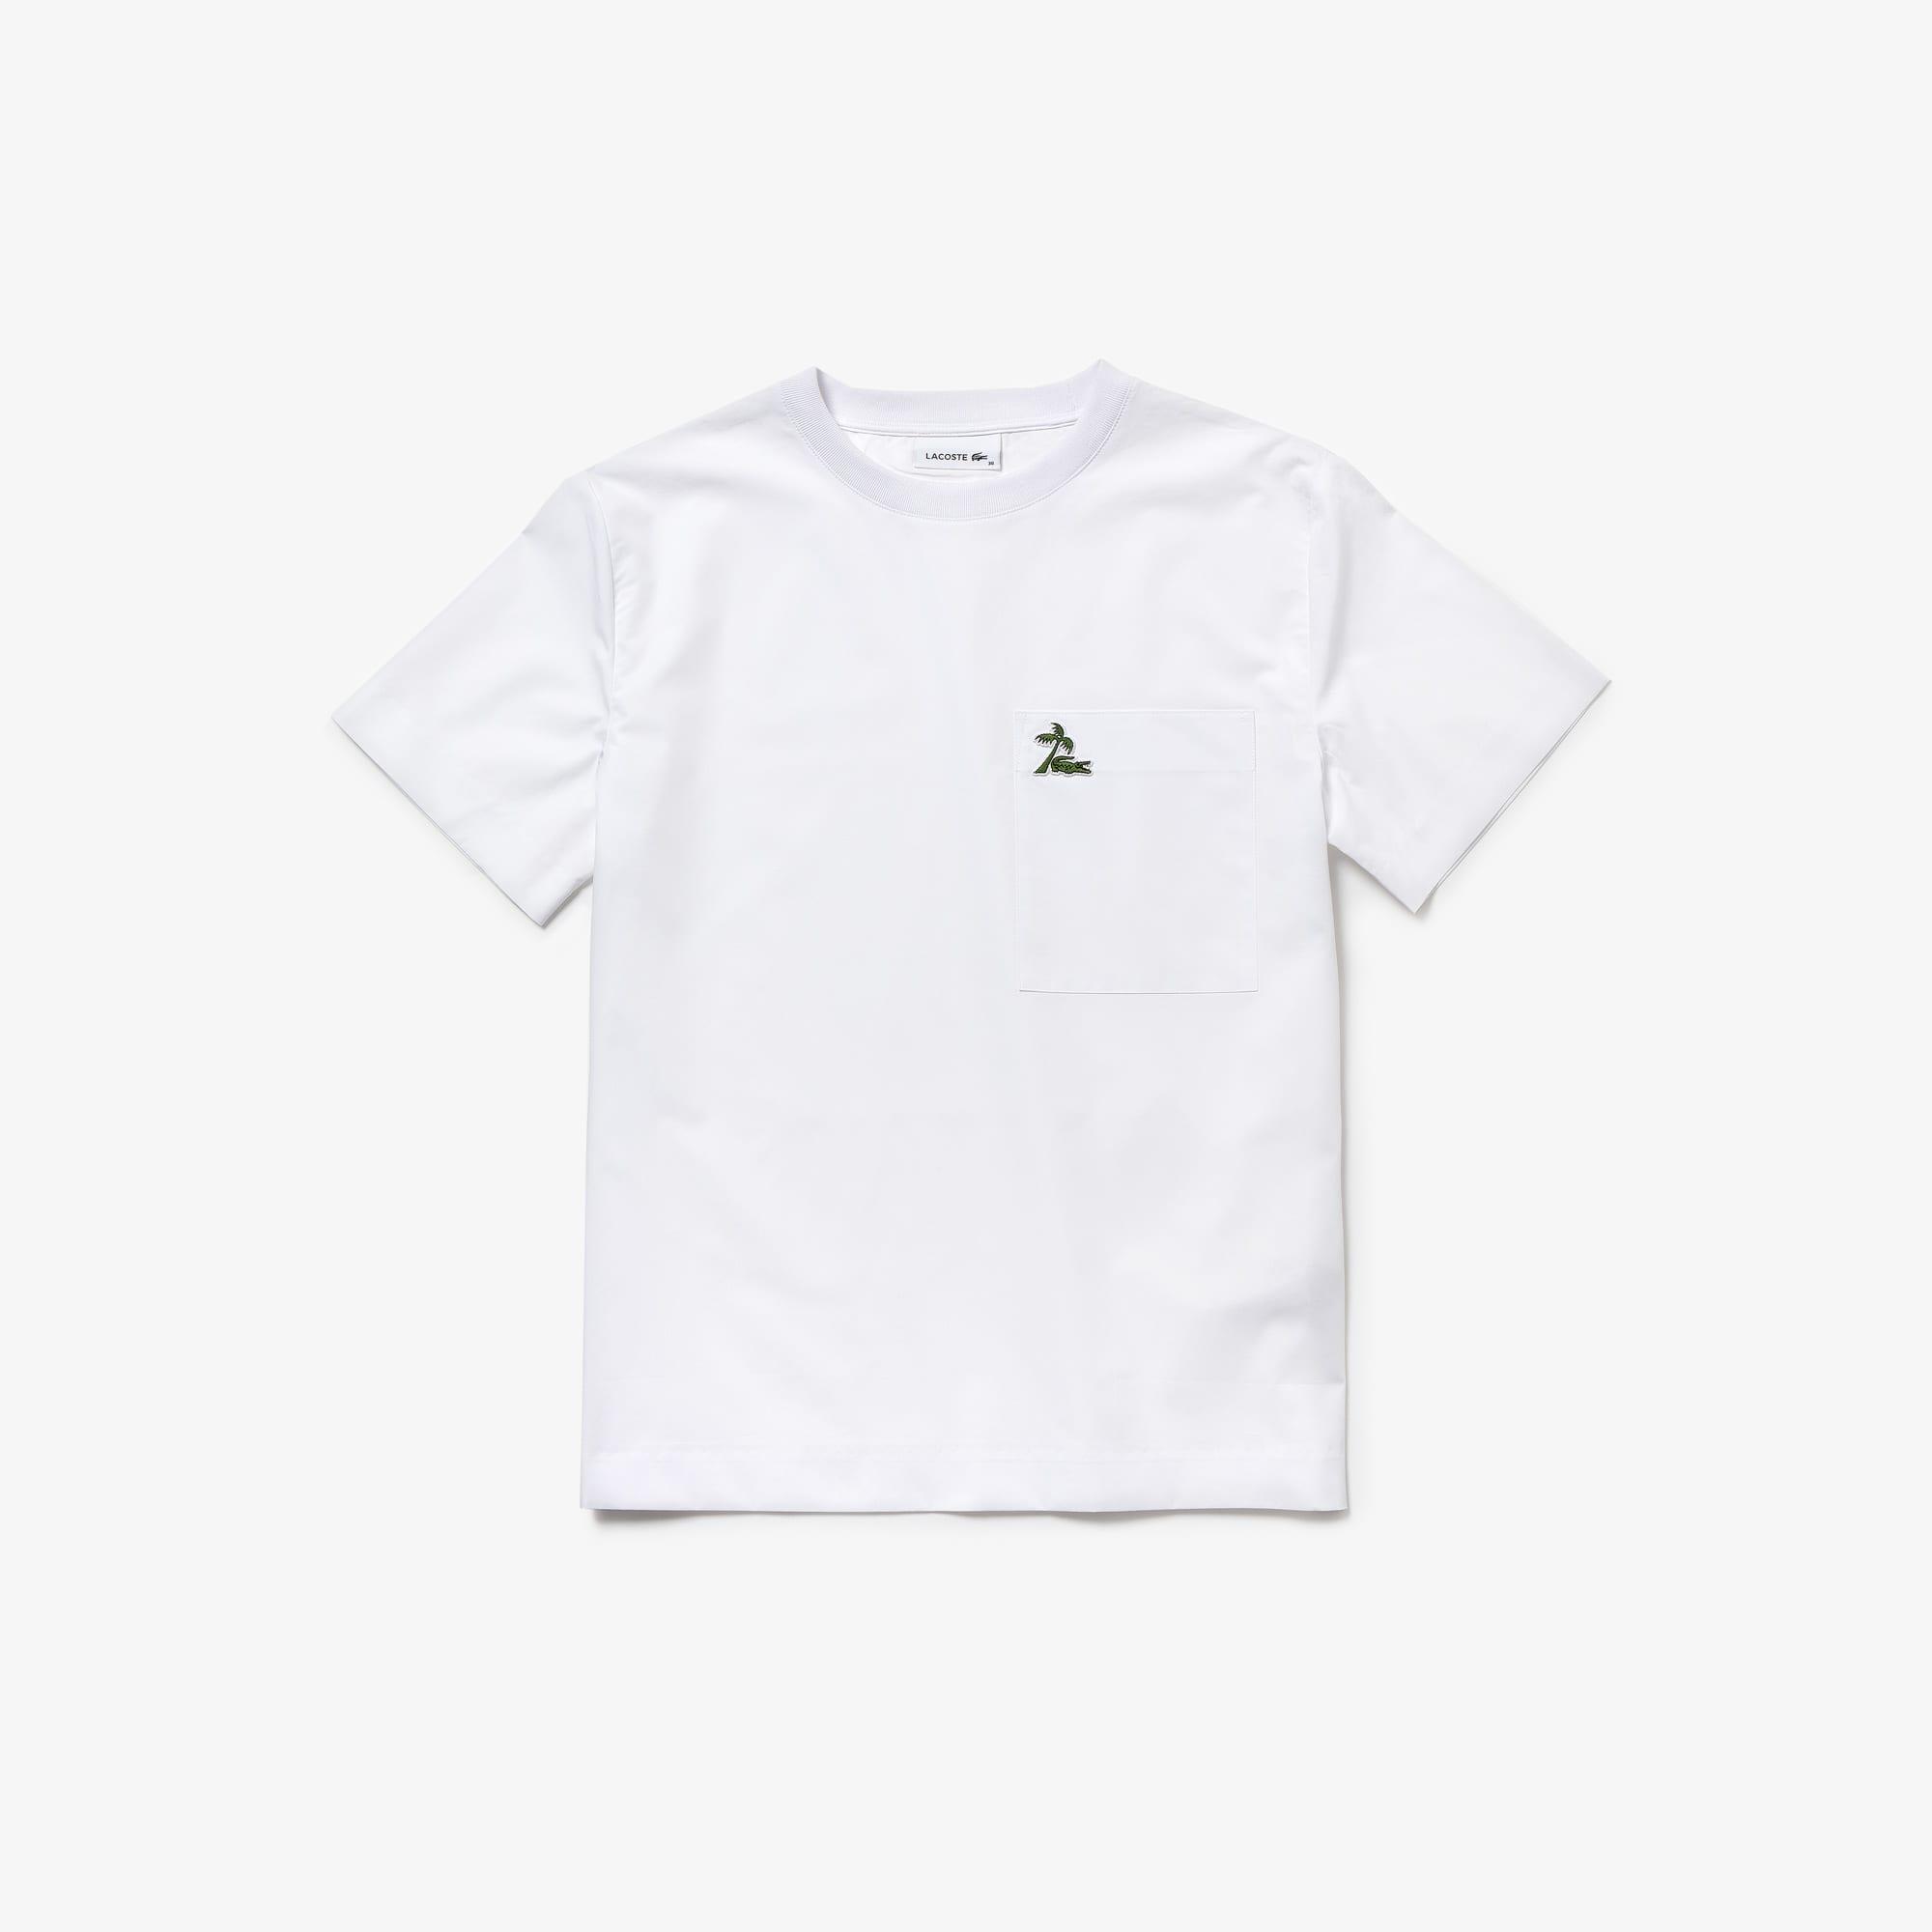 Women's Wide Neck Cotton Poplin Palm Tree Croc T-shirt